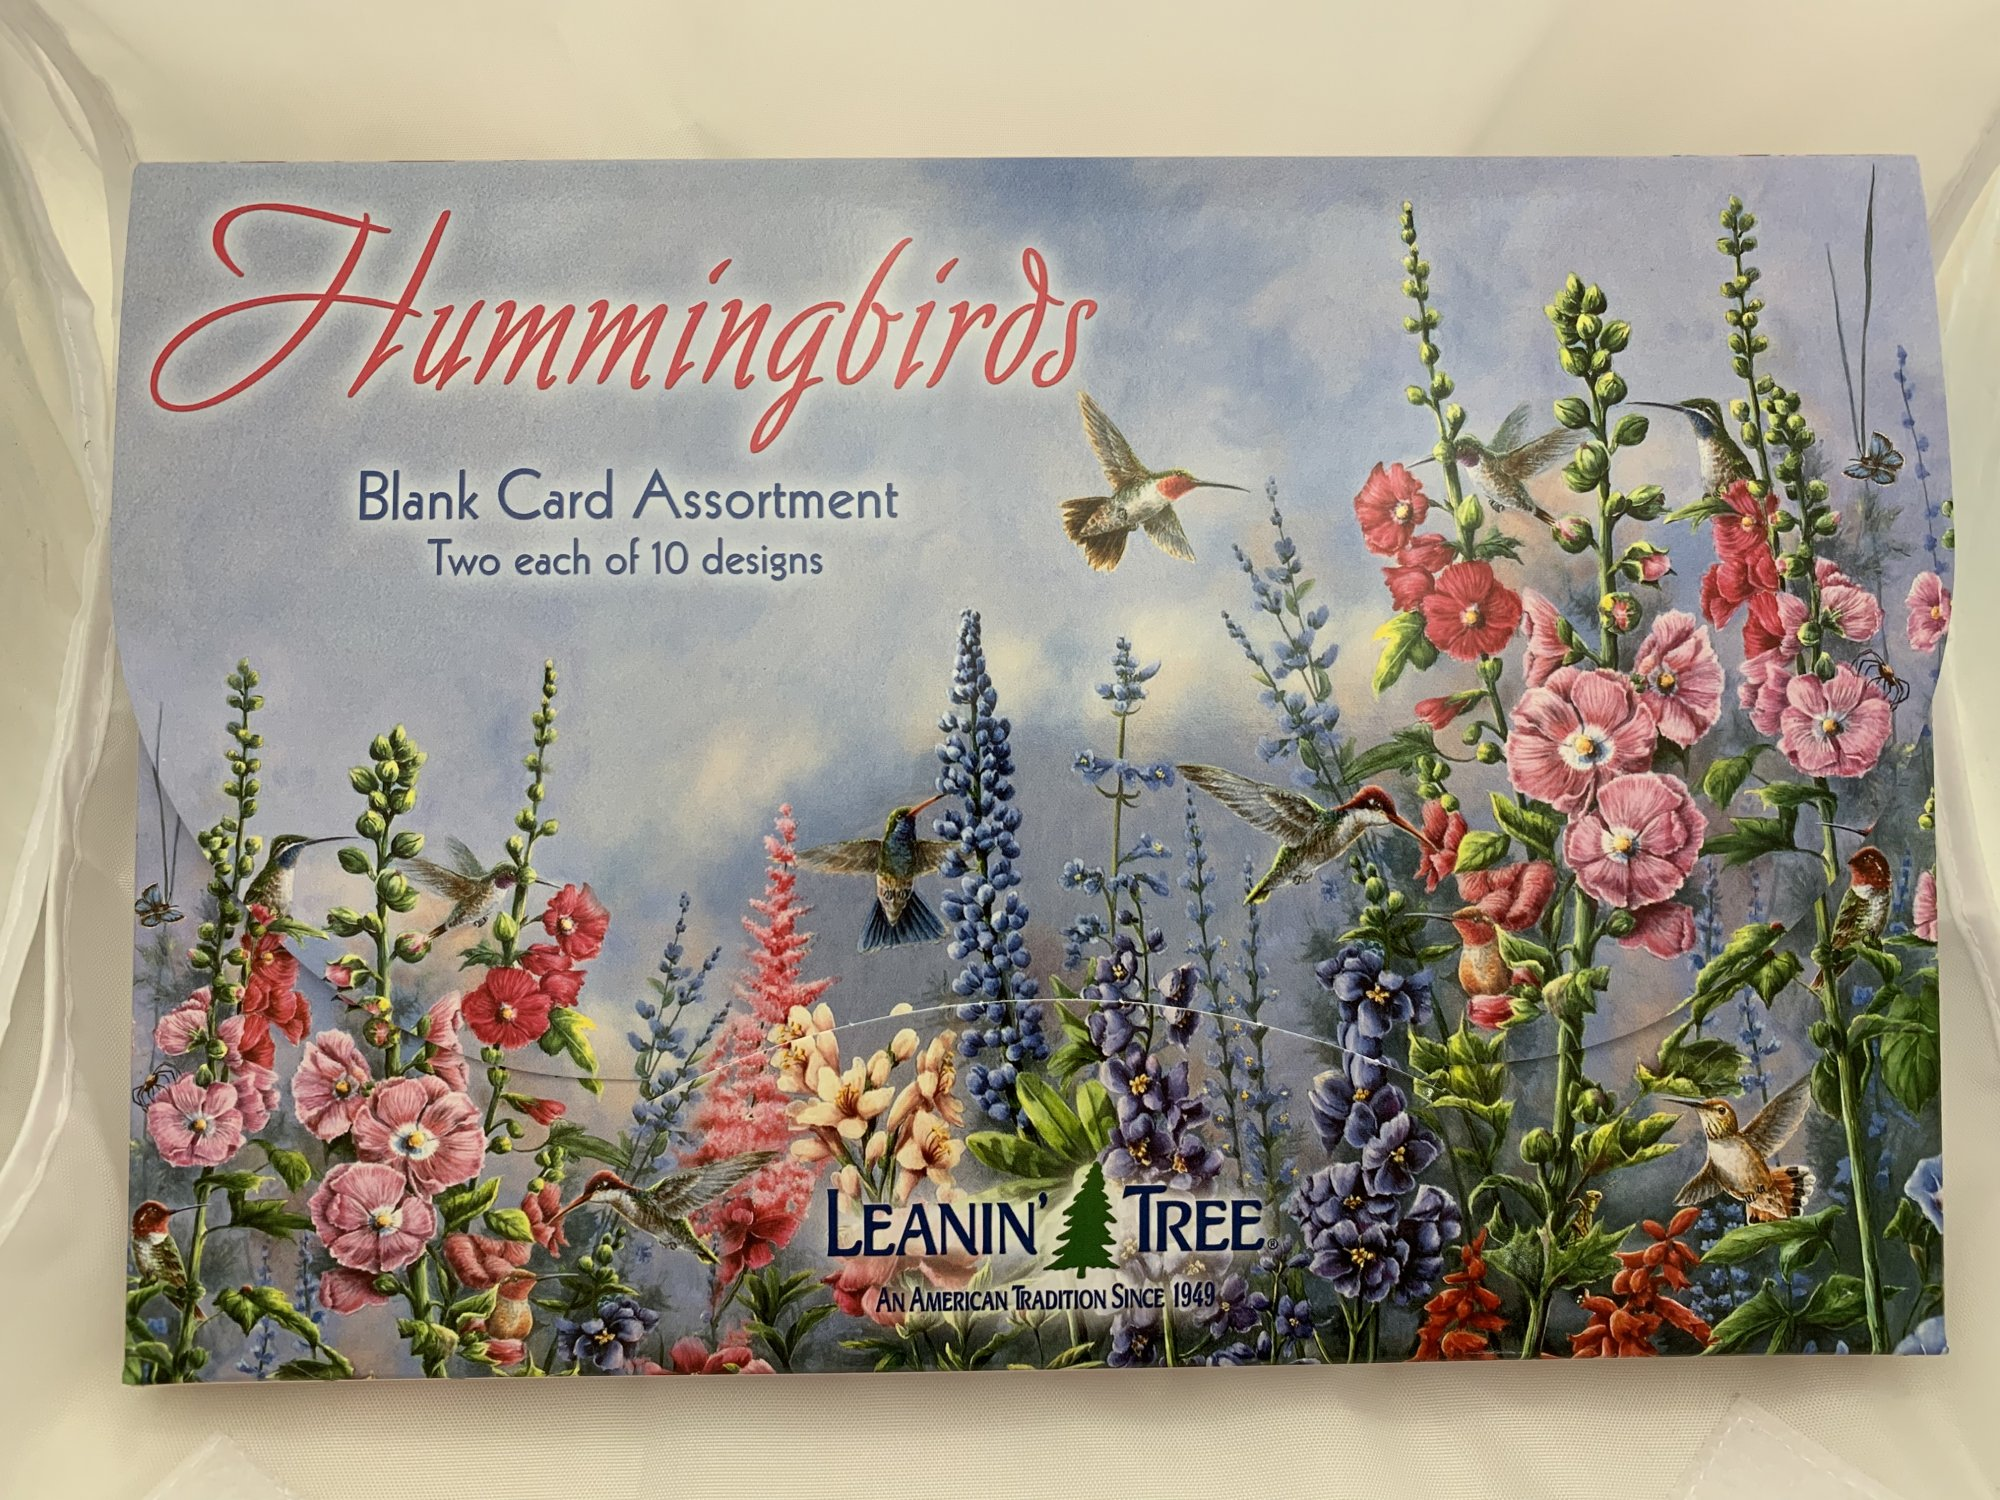 Hummingbirds Blank Greeting Card Assortment